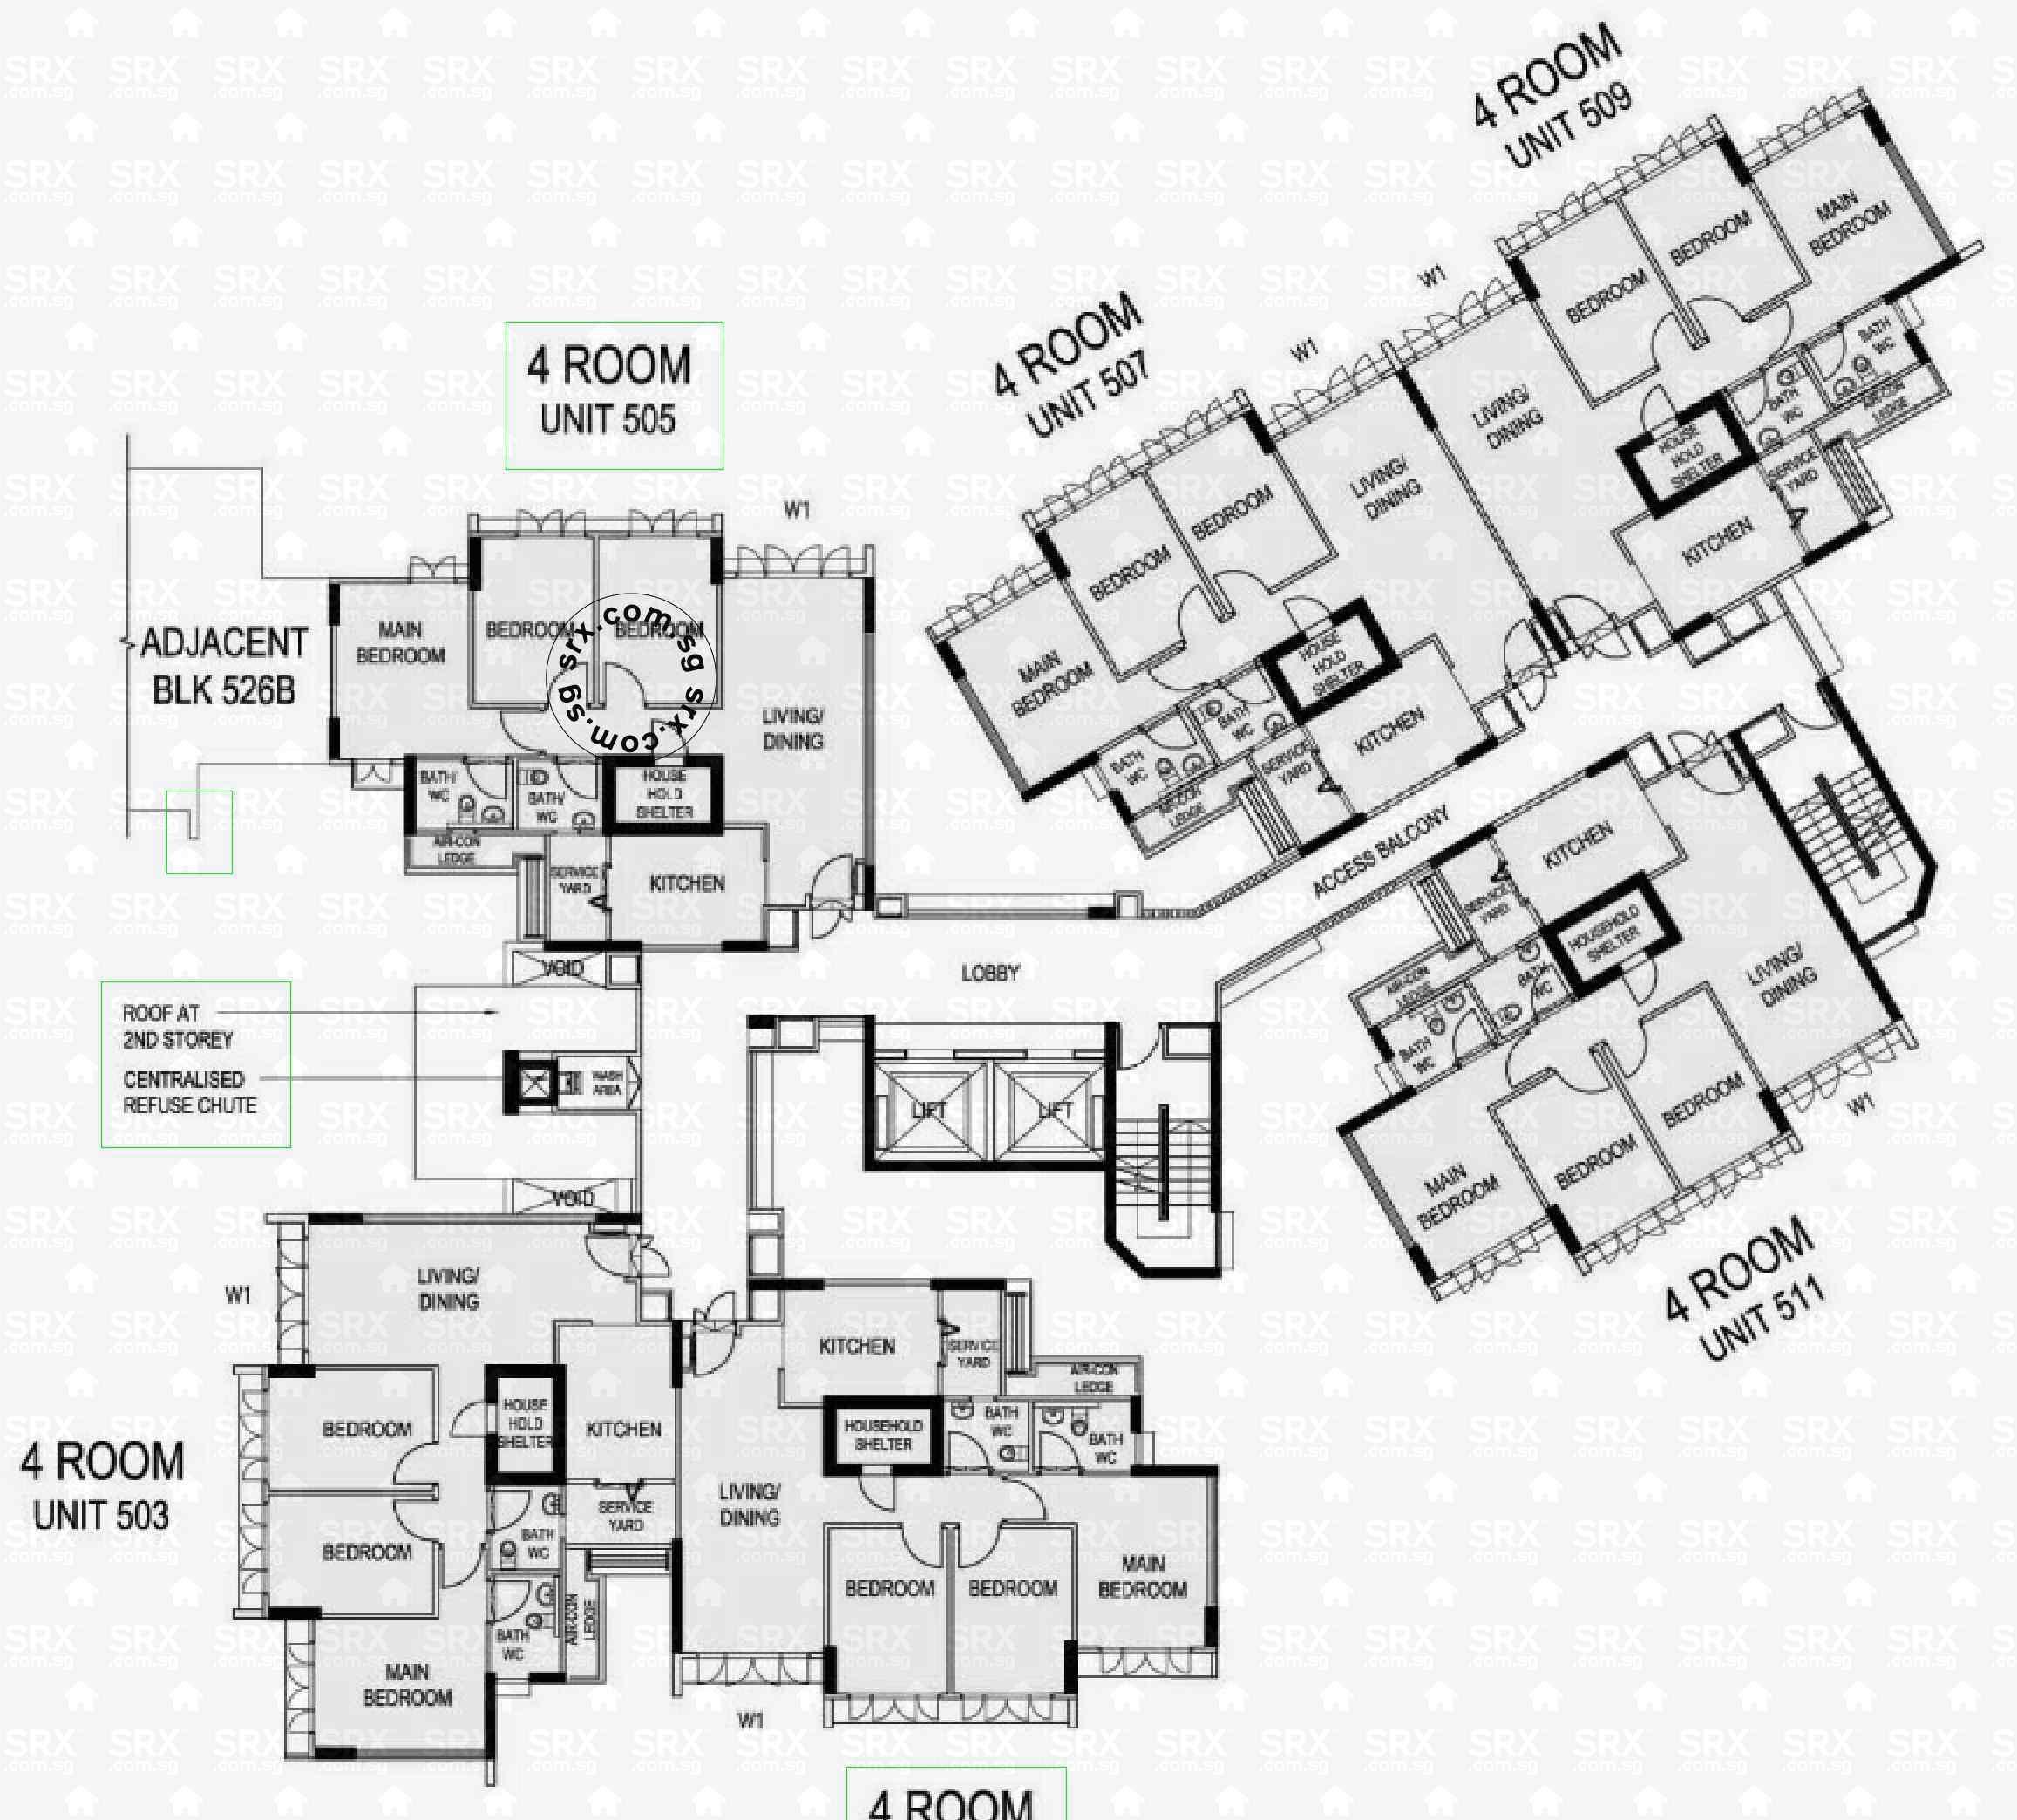 Floor Plans For 526a Pasir Ris Street 51 S 511526 Hdb